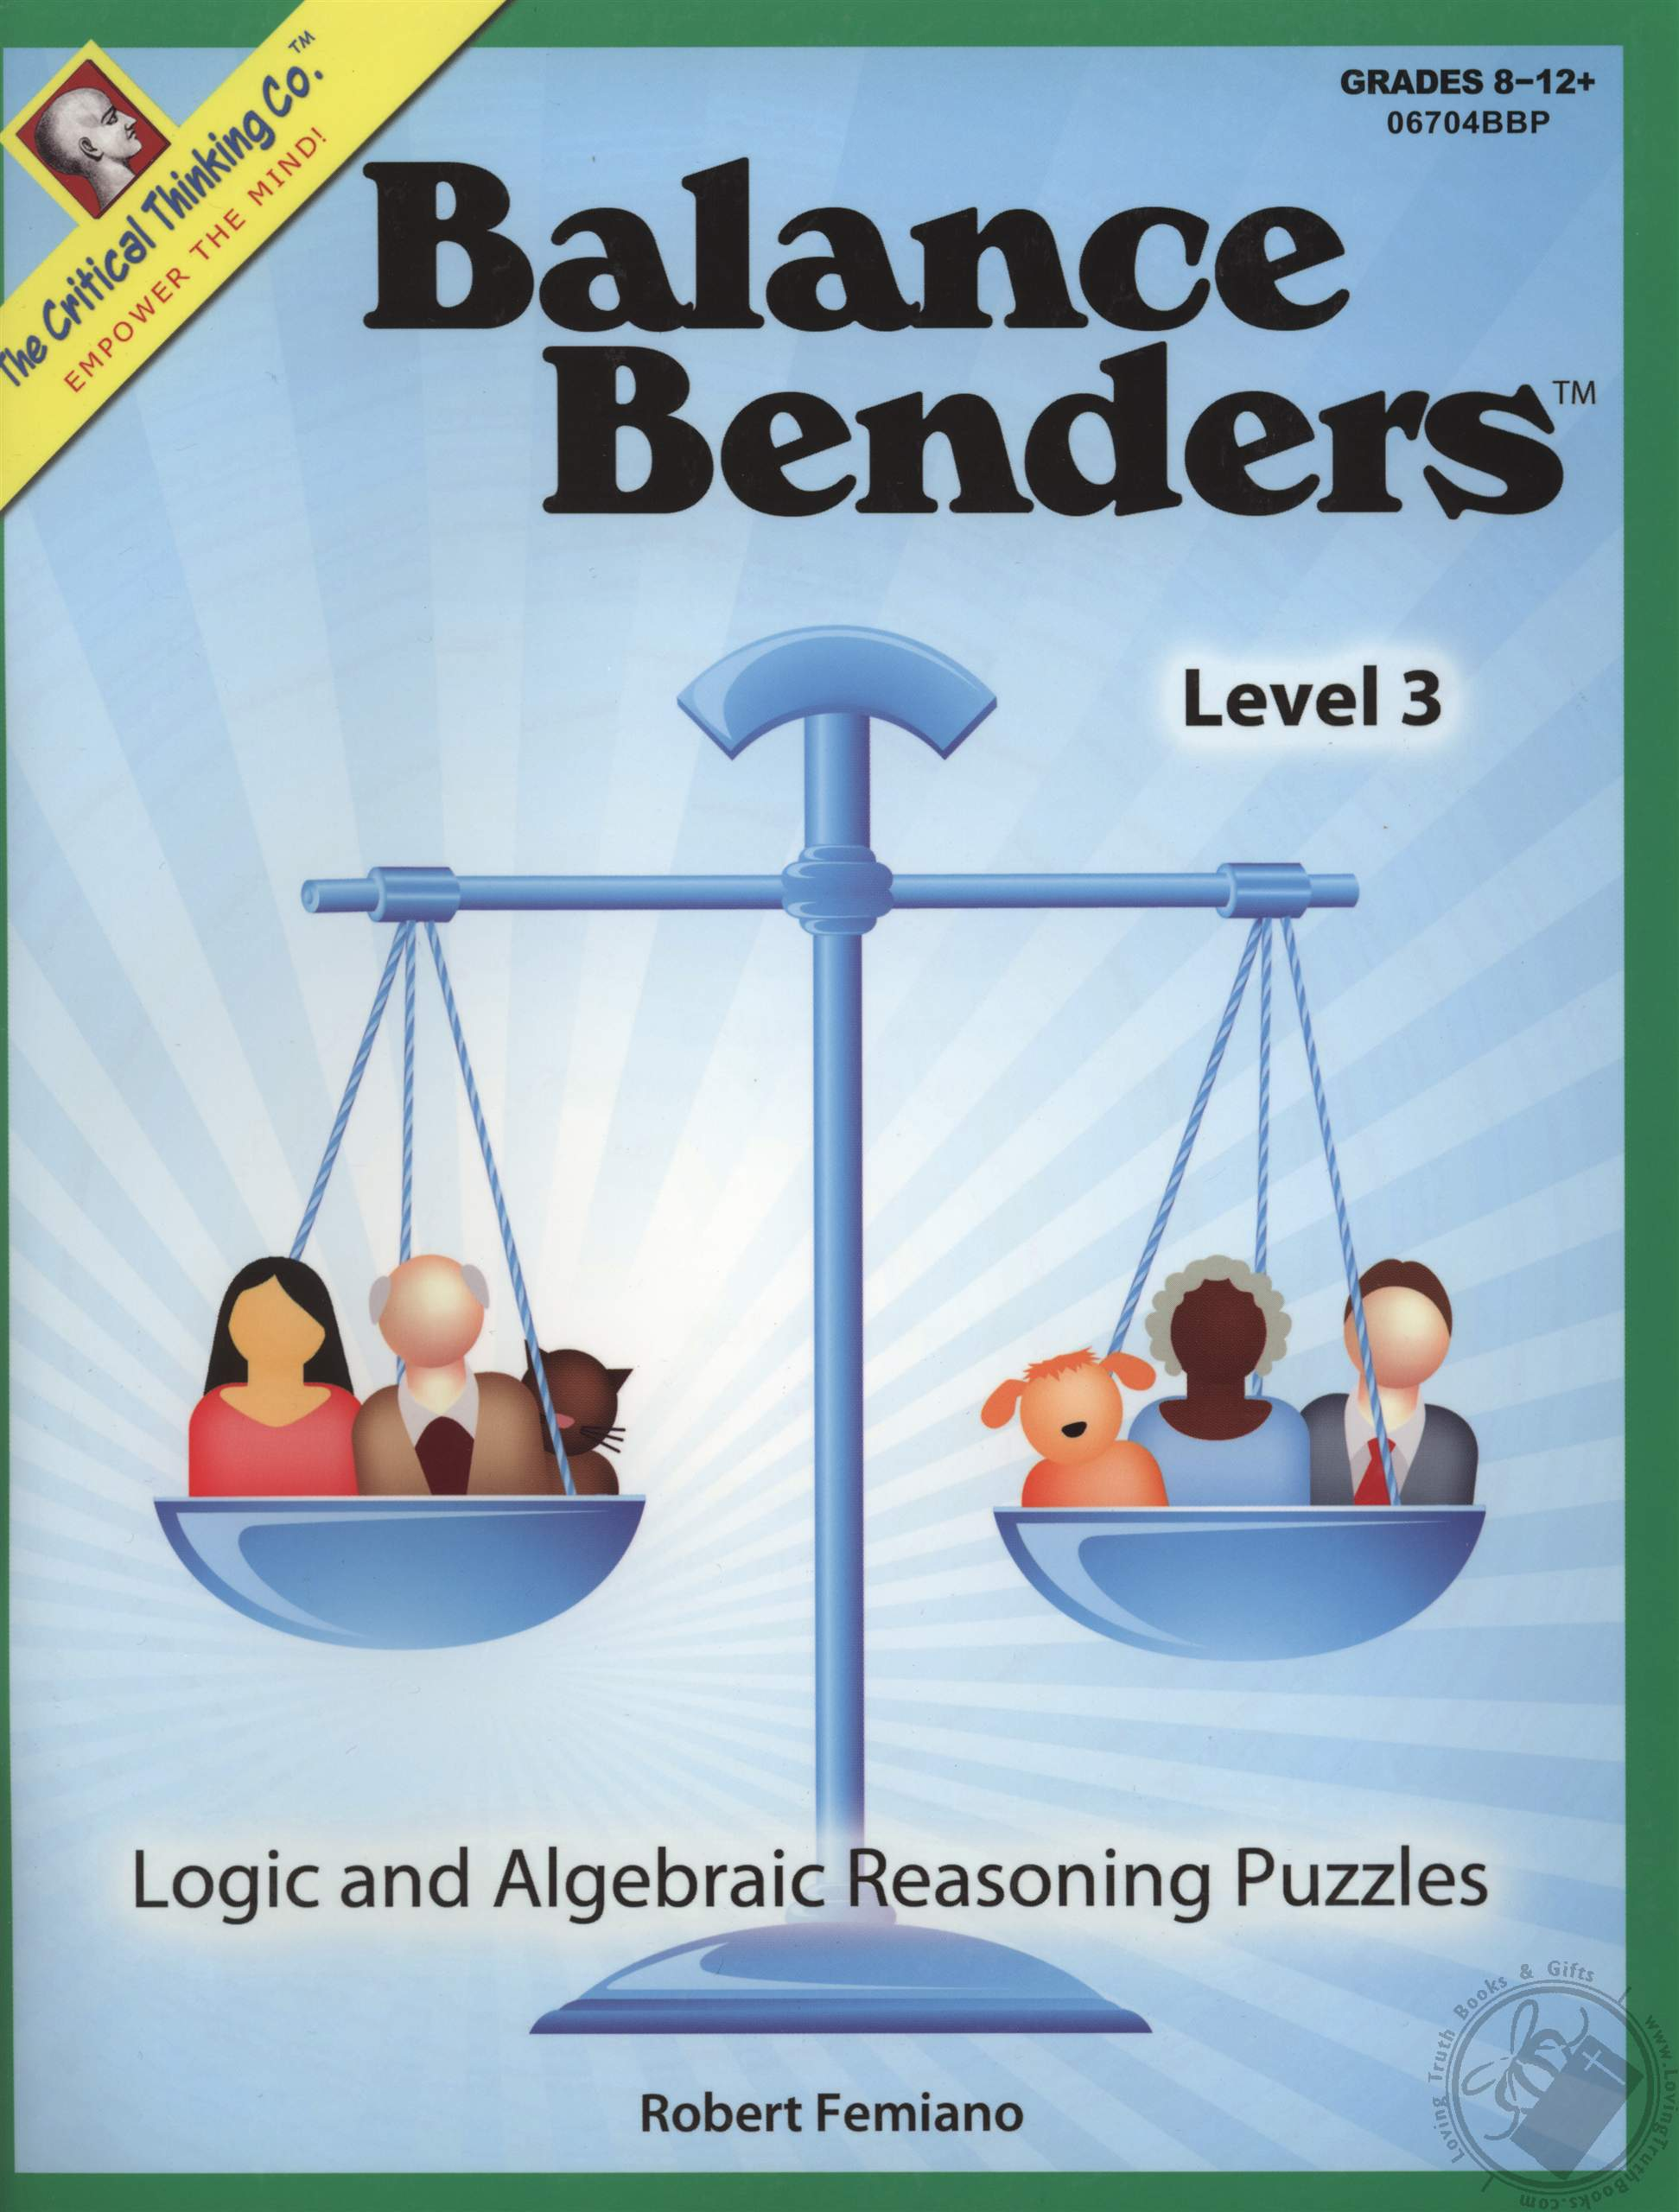 Balance Benders Level 3 Logic And Algebraic Reasoning